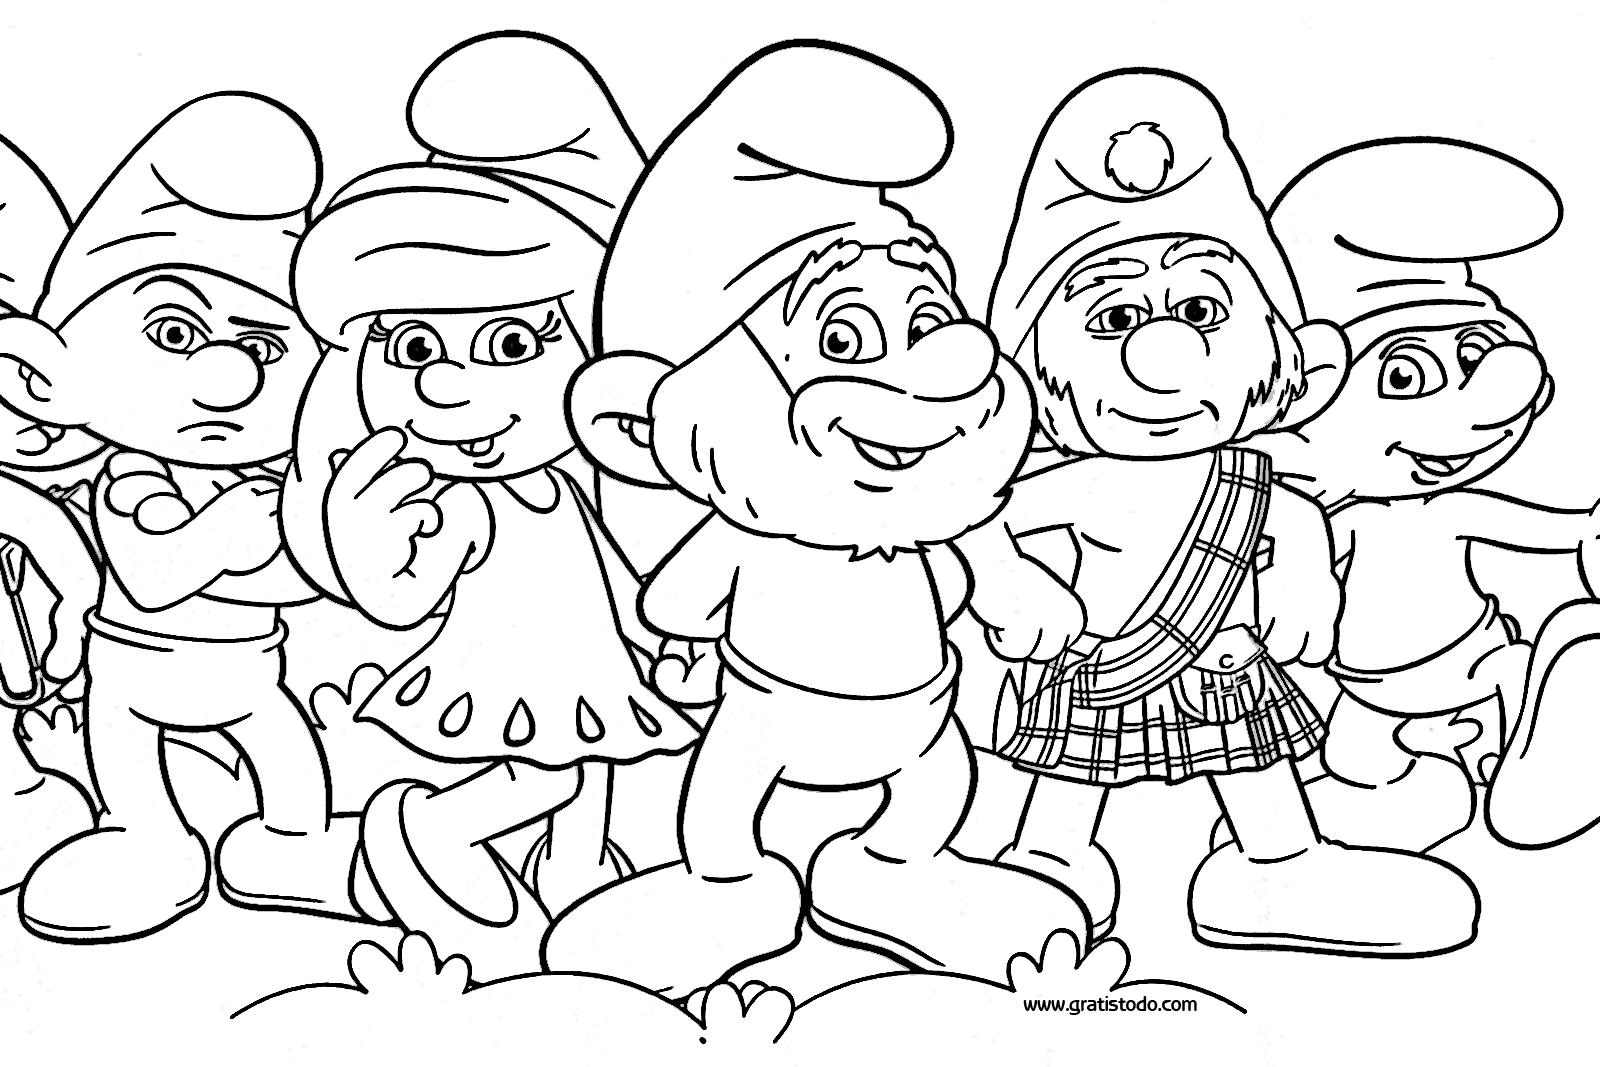 Dibujos Para Ninos Para Colorear E Imprimir: Dibujos De Los Pitufos Para Colorear, Pitufos Imprimir Gratis